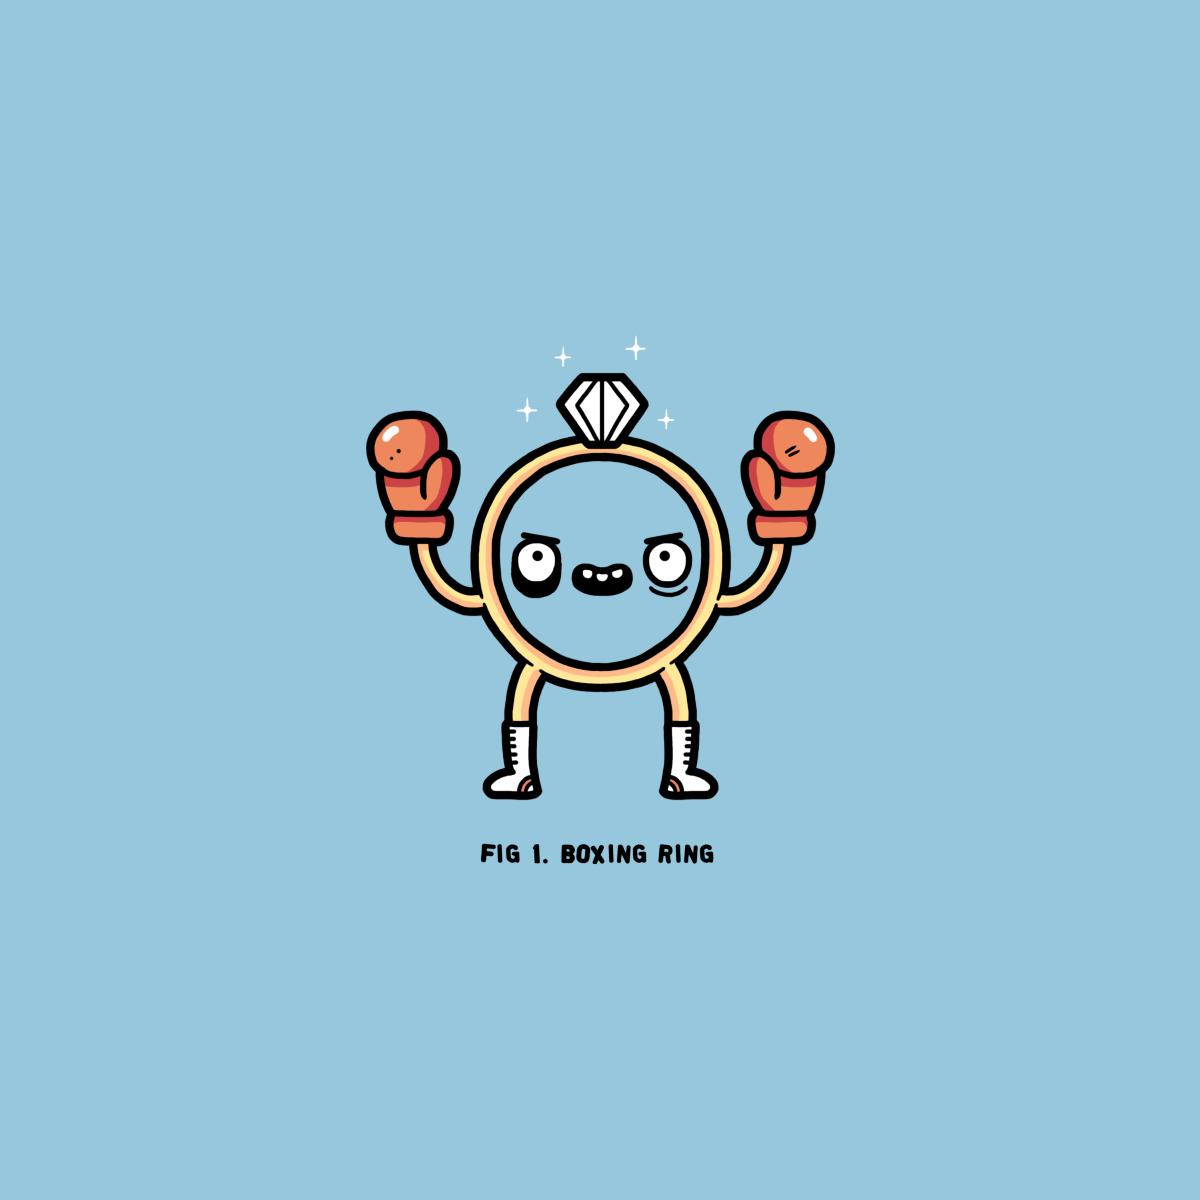 Boxing Ring Corny Boxing Rings Funny